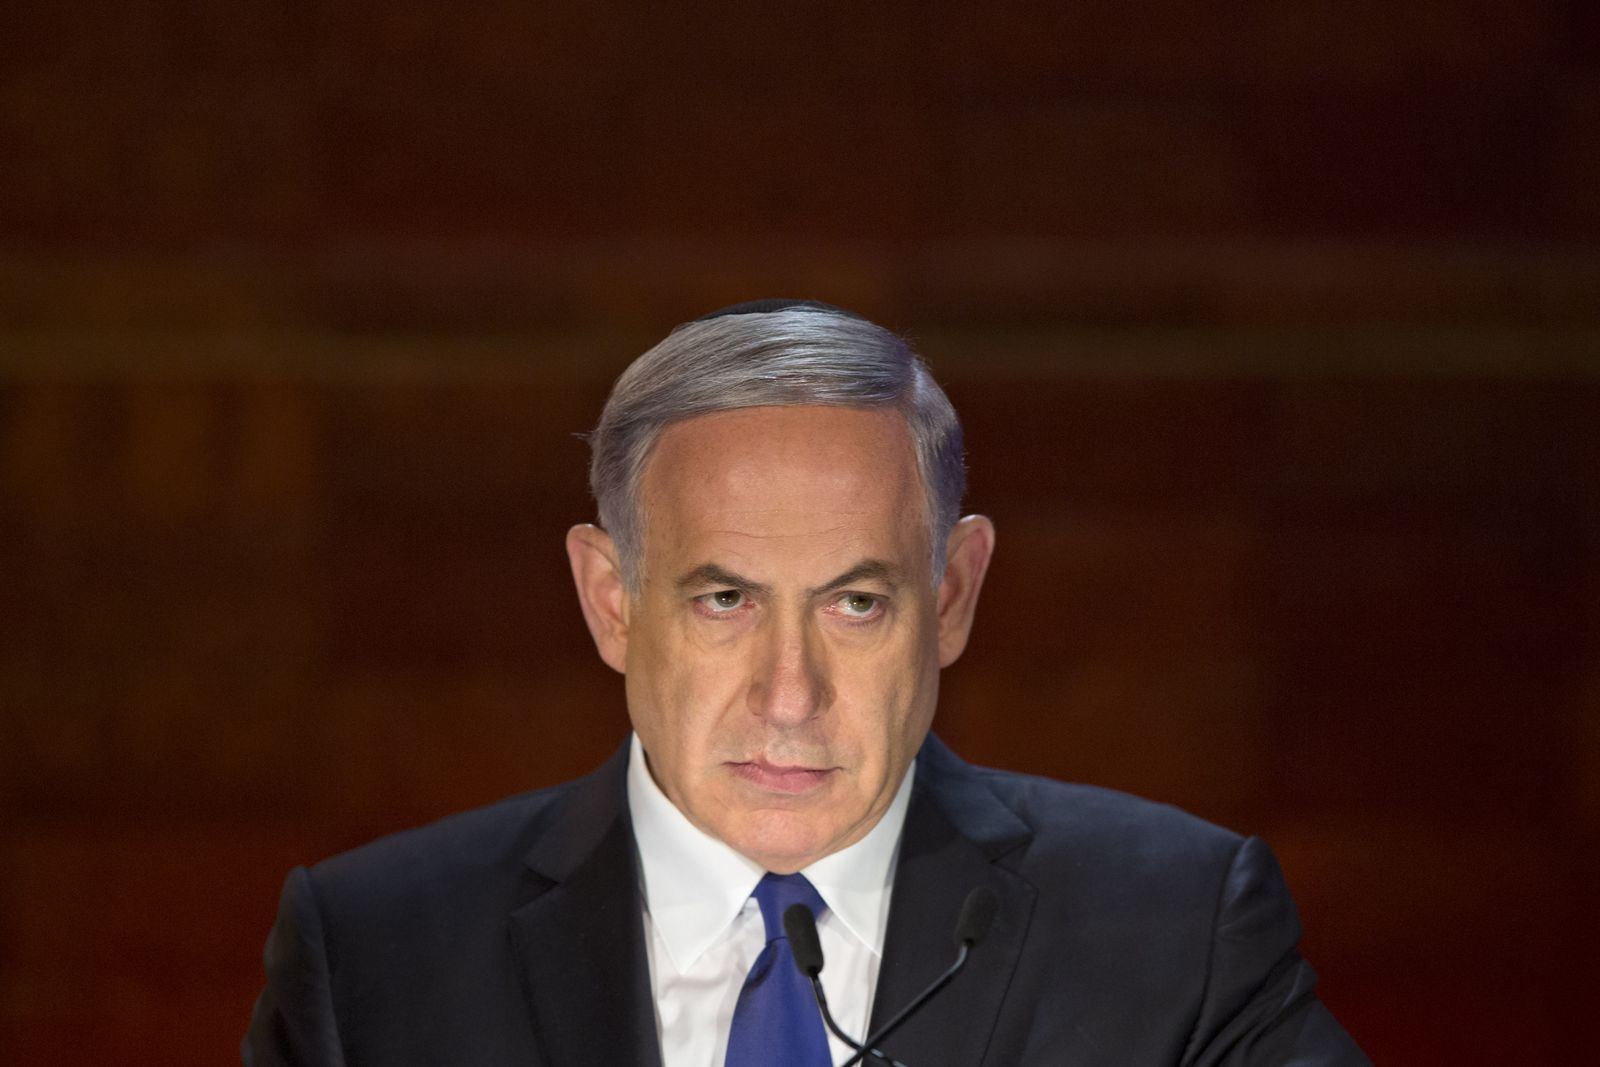 Benjamin Netanyahu/ Israel